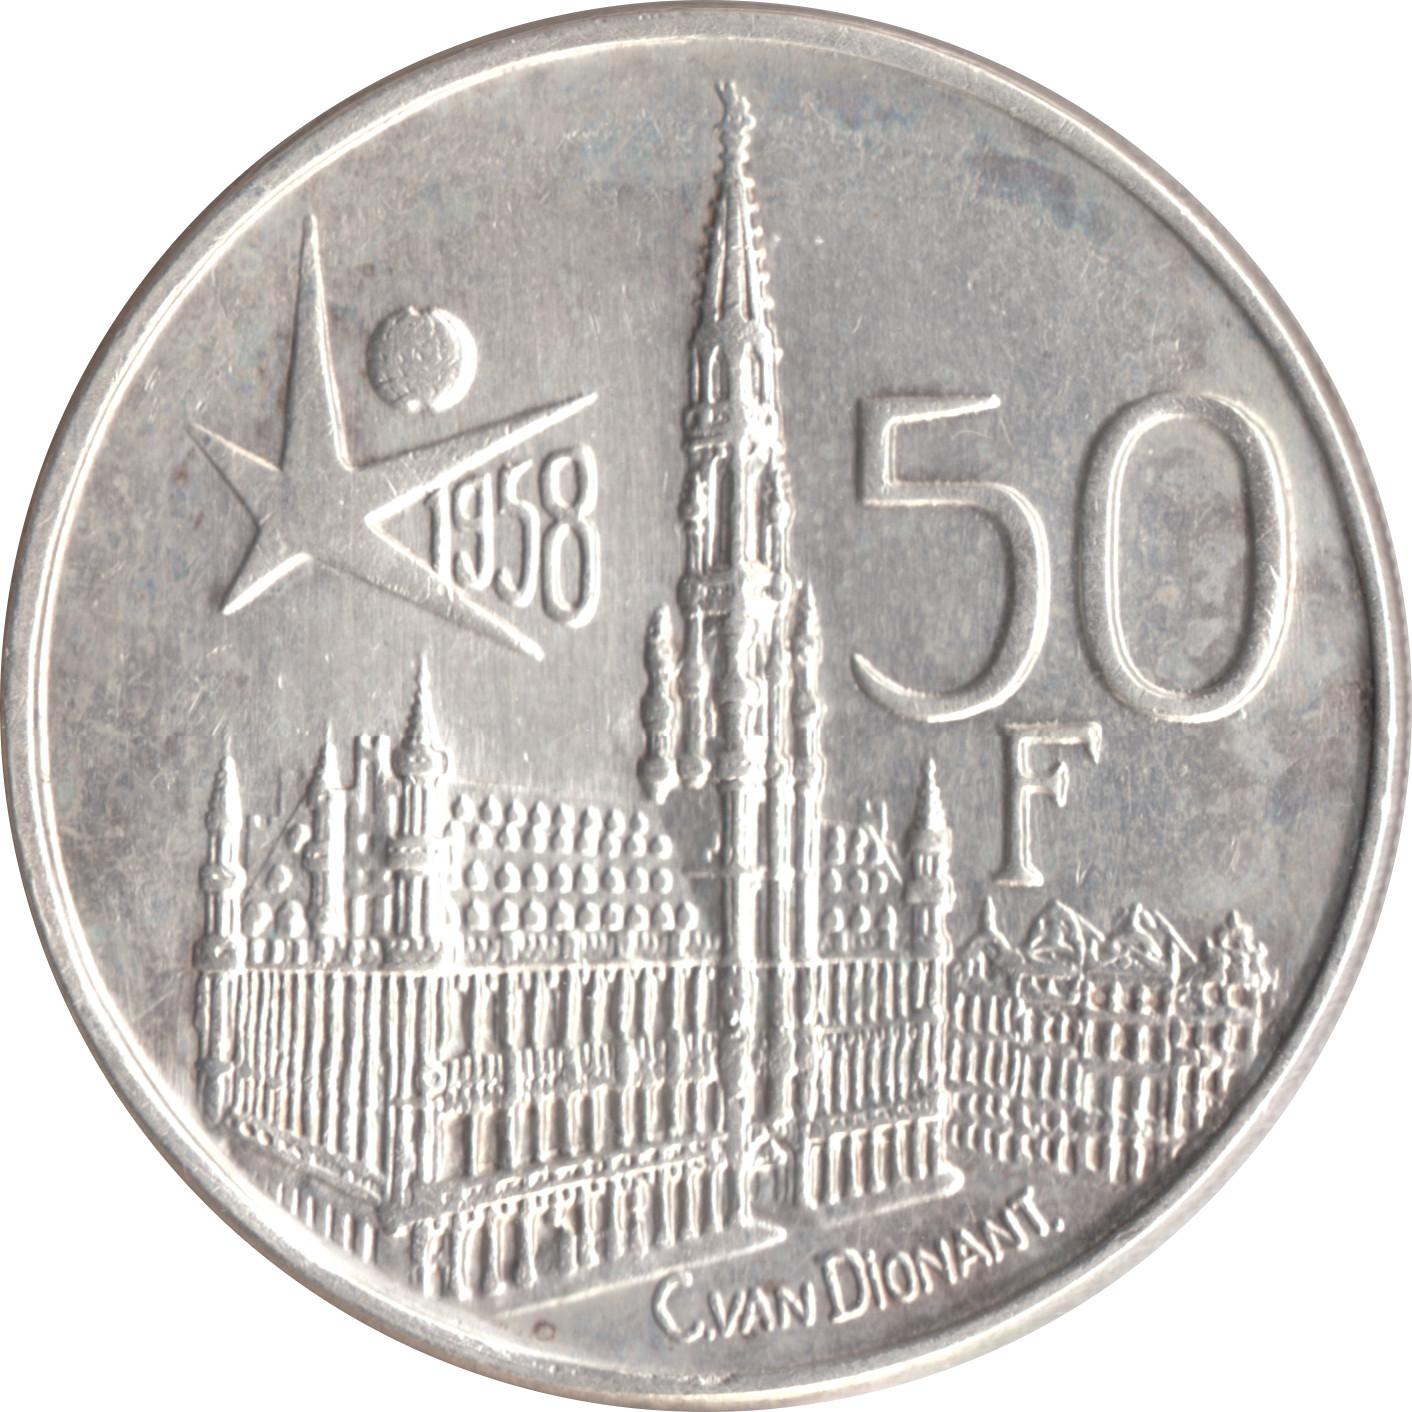 1958 Belgium World/'s Fair 50 Francs Brilliant Uncirculated Silver Coin